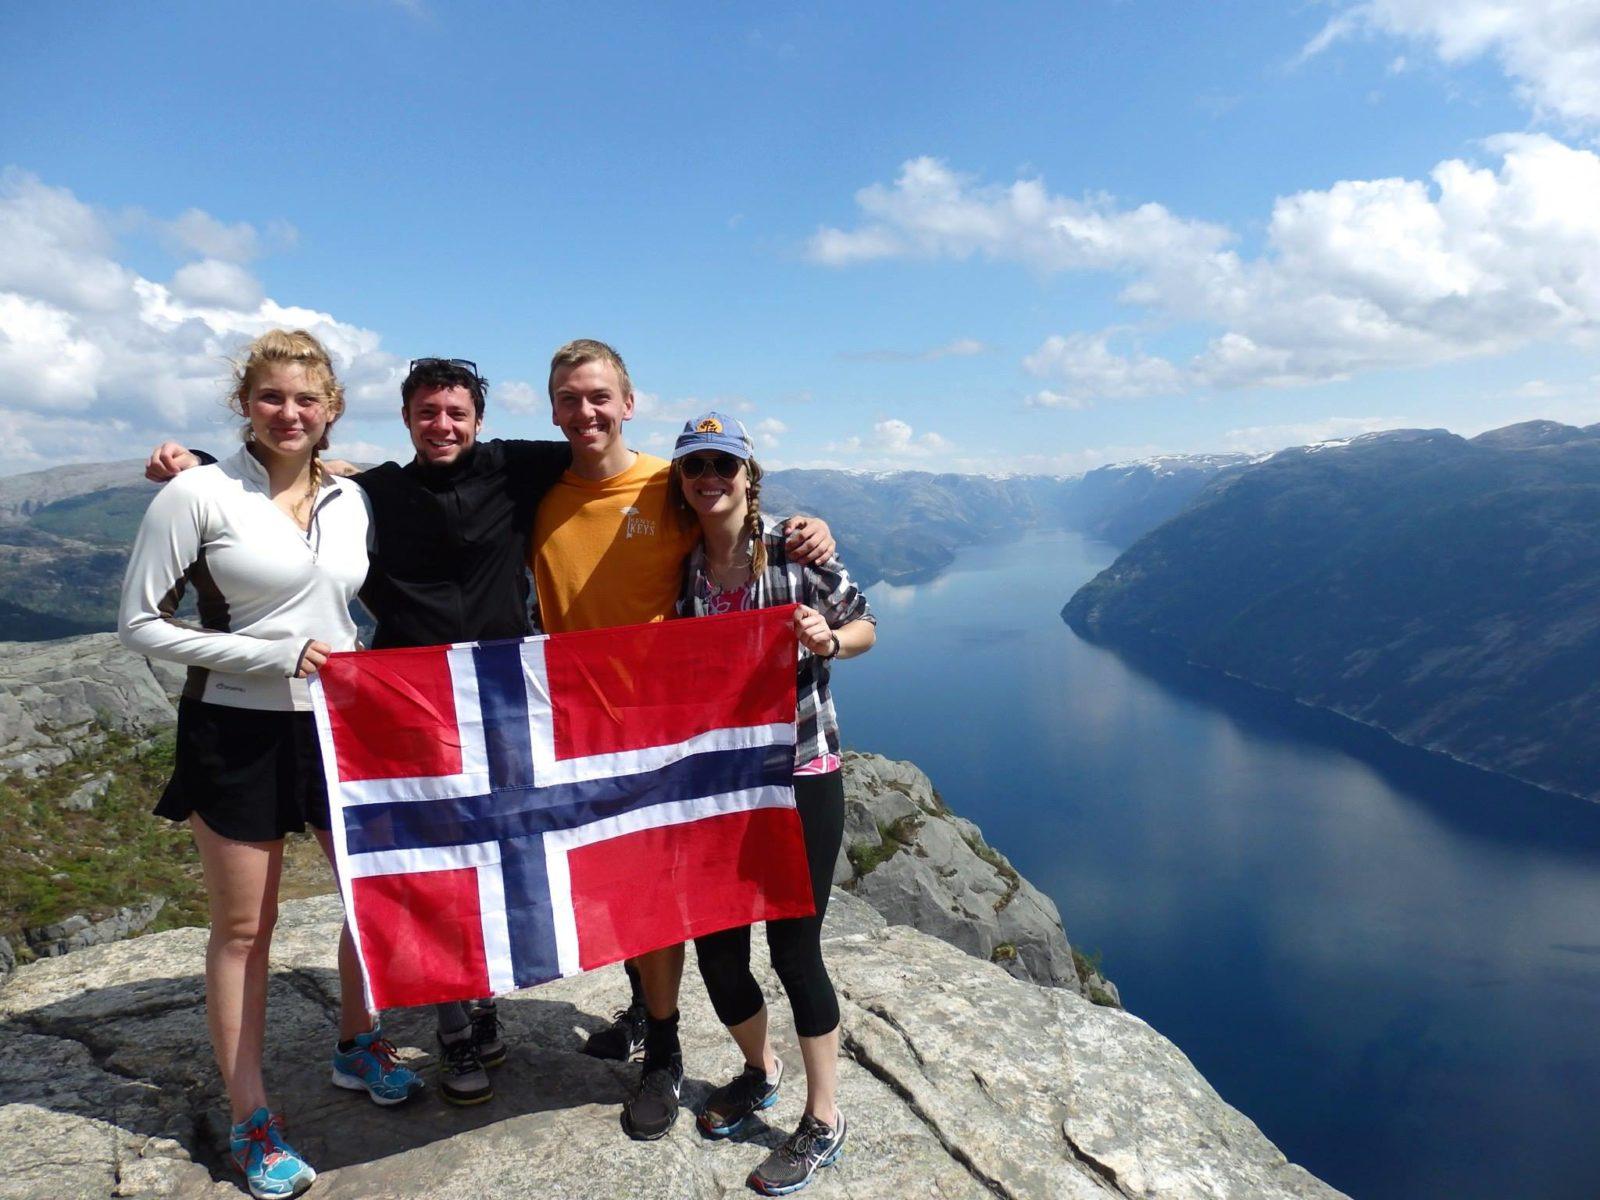 норвегия путешествие